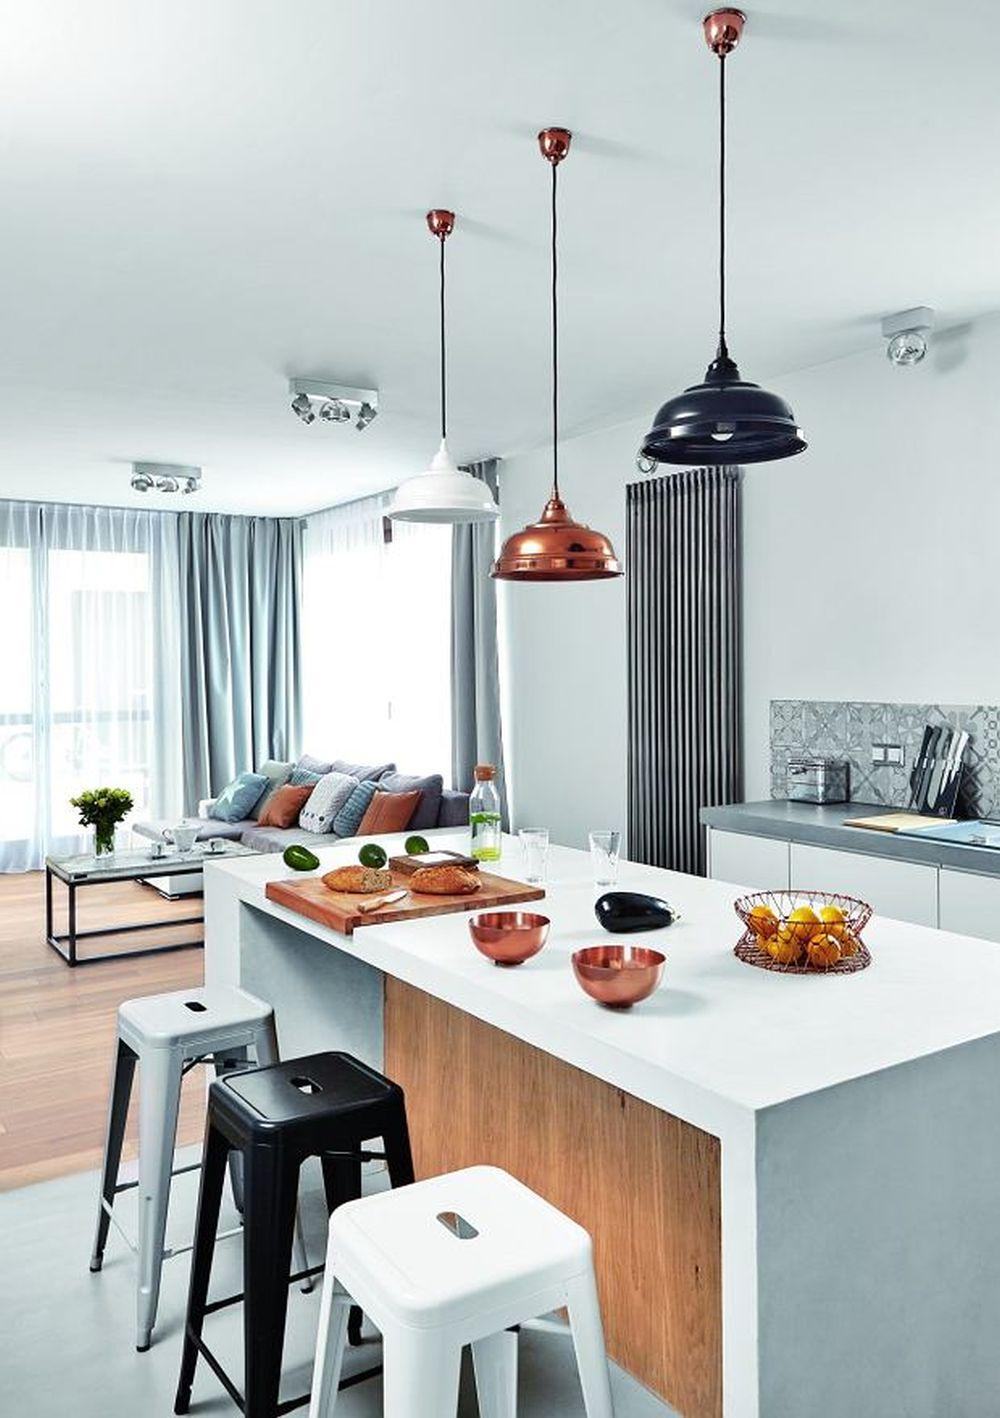 adelaparvu.com despre placari cu lemn in apartament 80 mp, Polonia, arh. Krystyna Regulska, Foto Michal Skorupski (6)